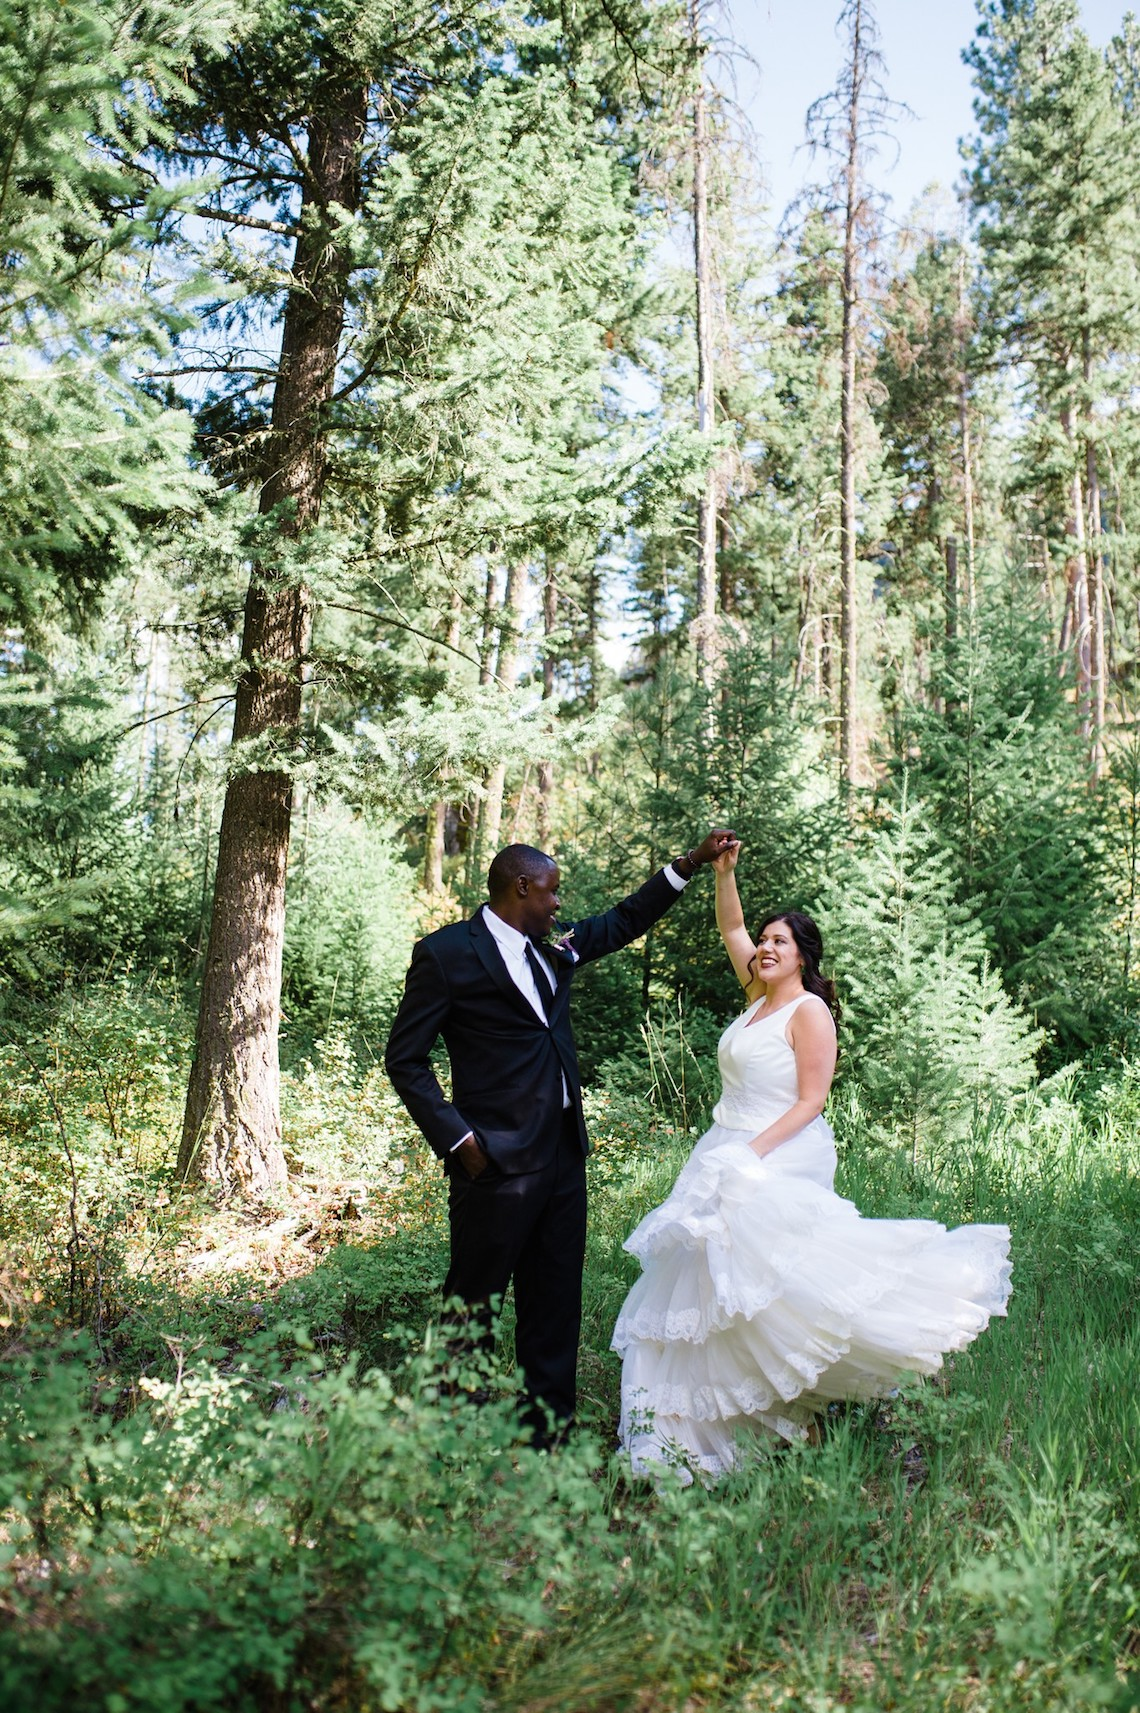 Whimsical Forest Lodge Congolese American Wedding – Honeybee Weddings 39